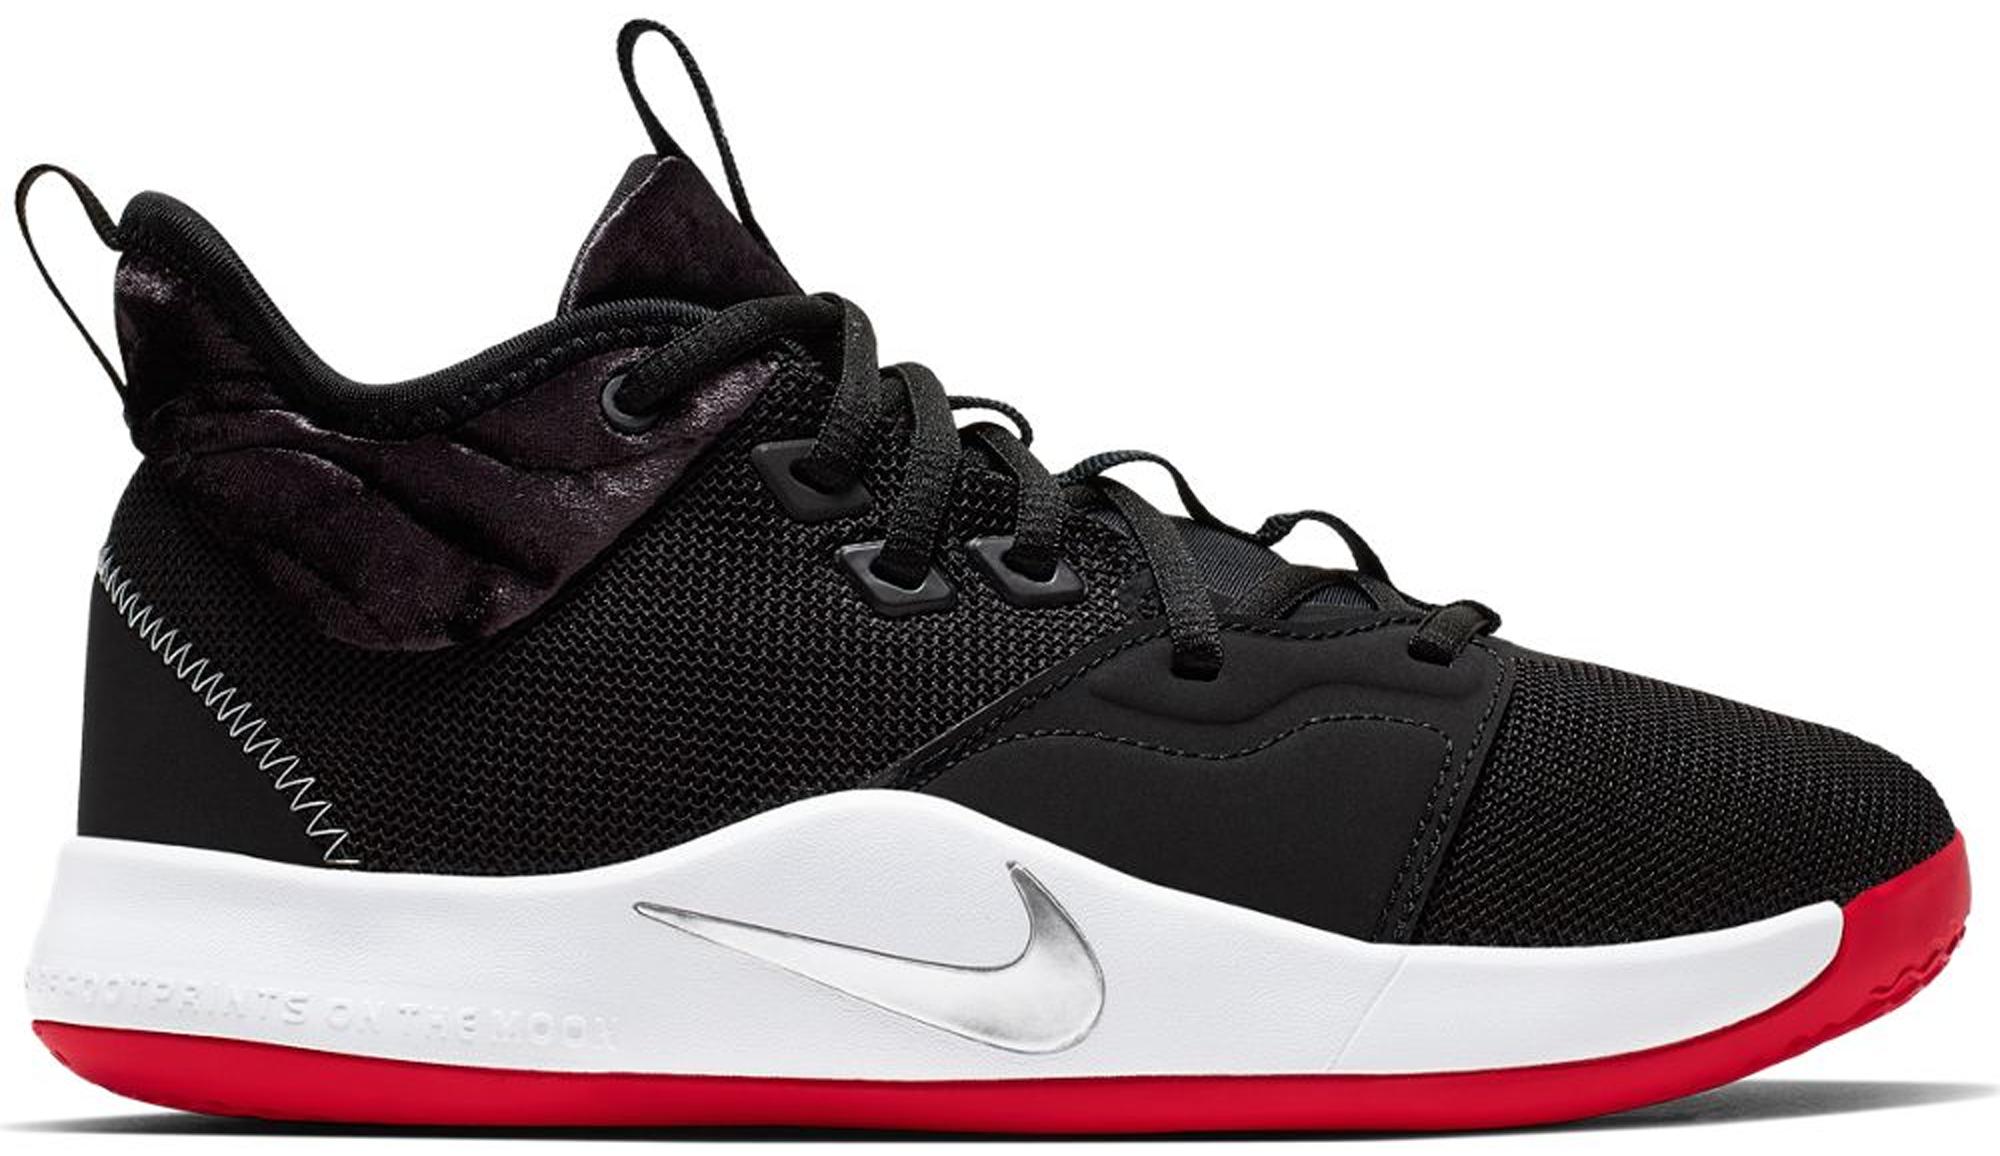 Nike PG 3 Velour Bred (GS) - AQ2462-016